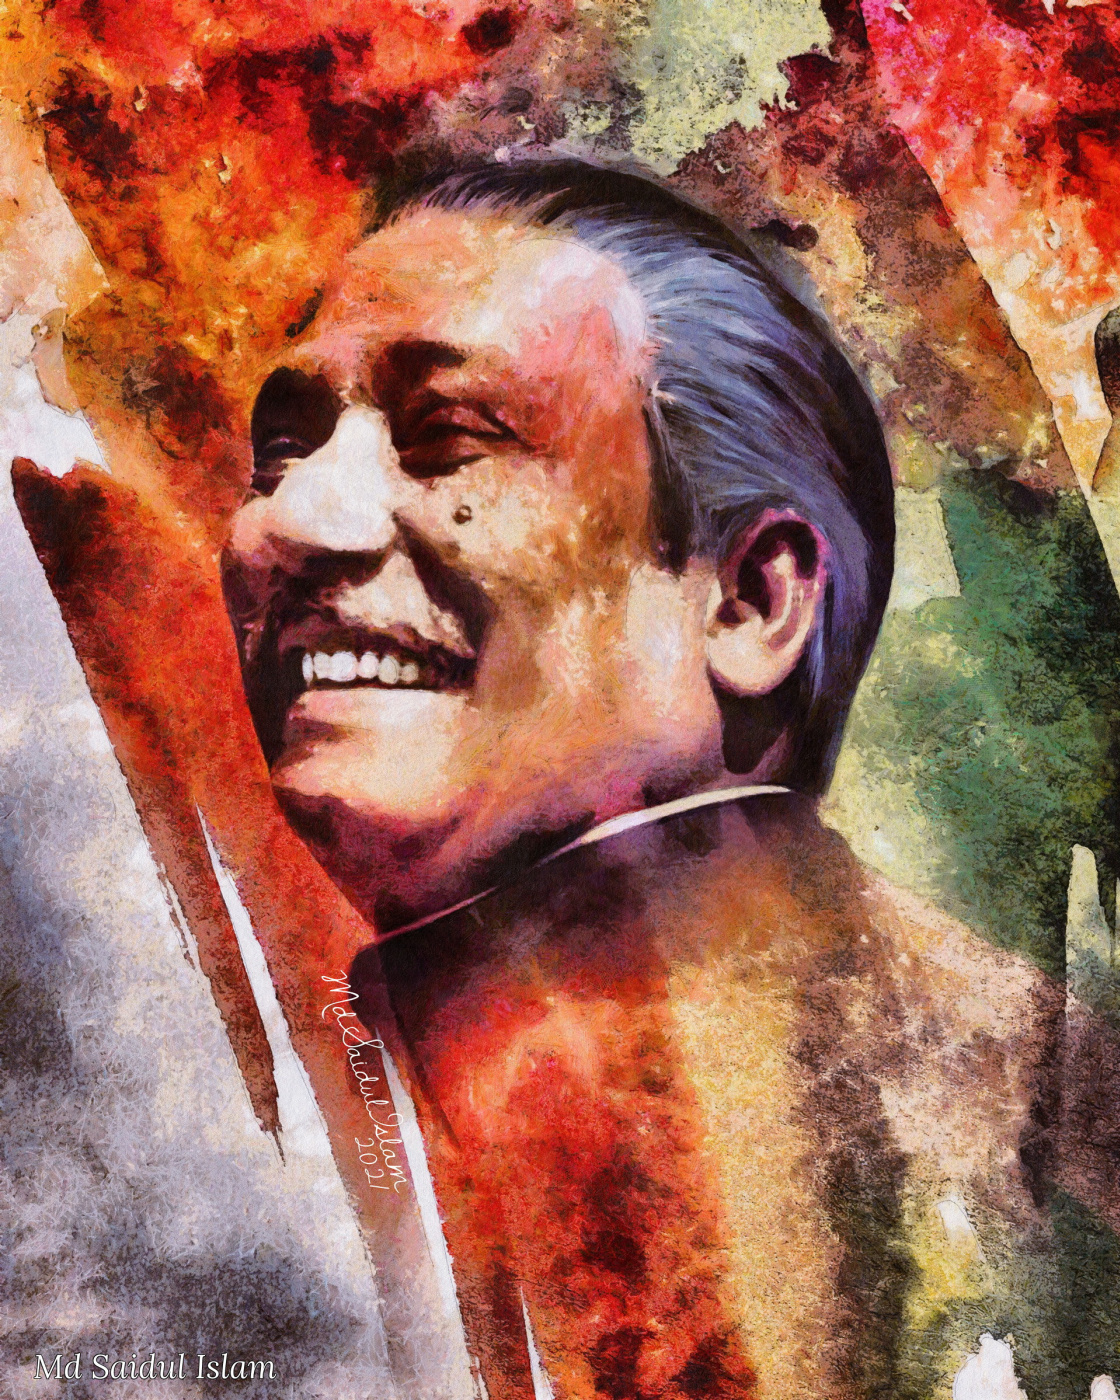 Md Saidul Islam. Bangabandhu - The Liberator